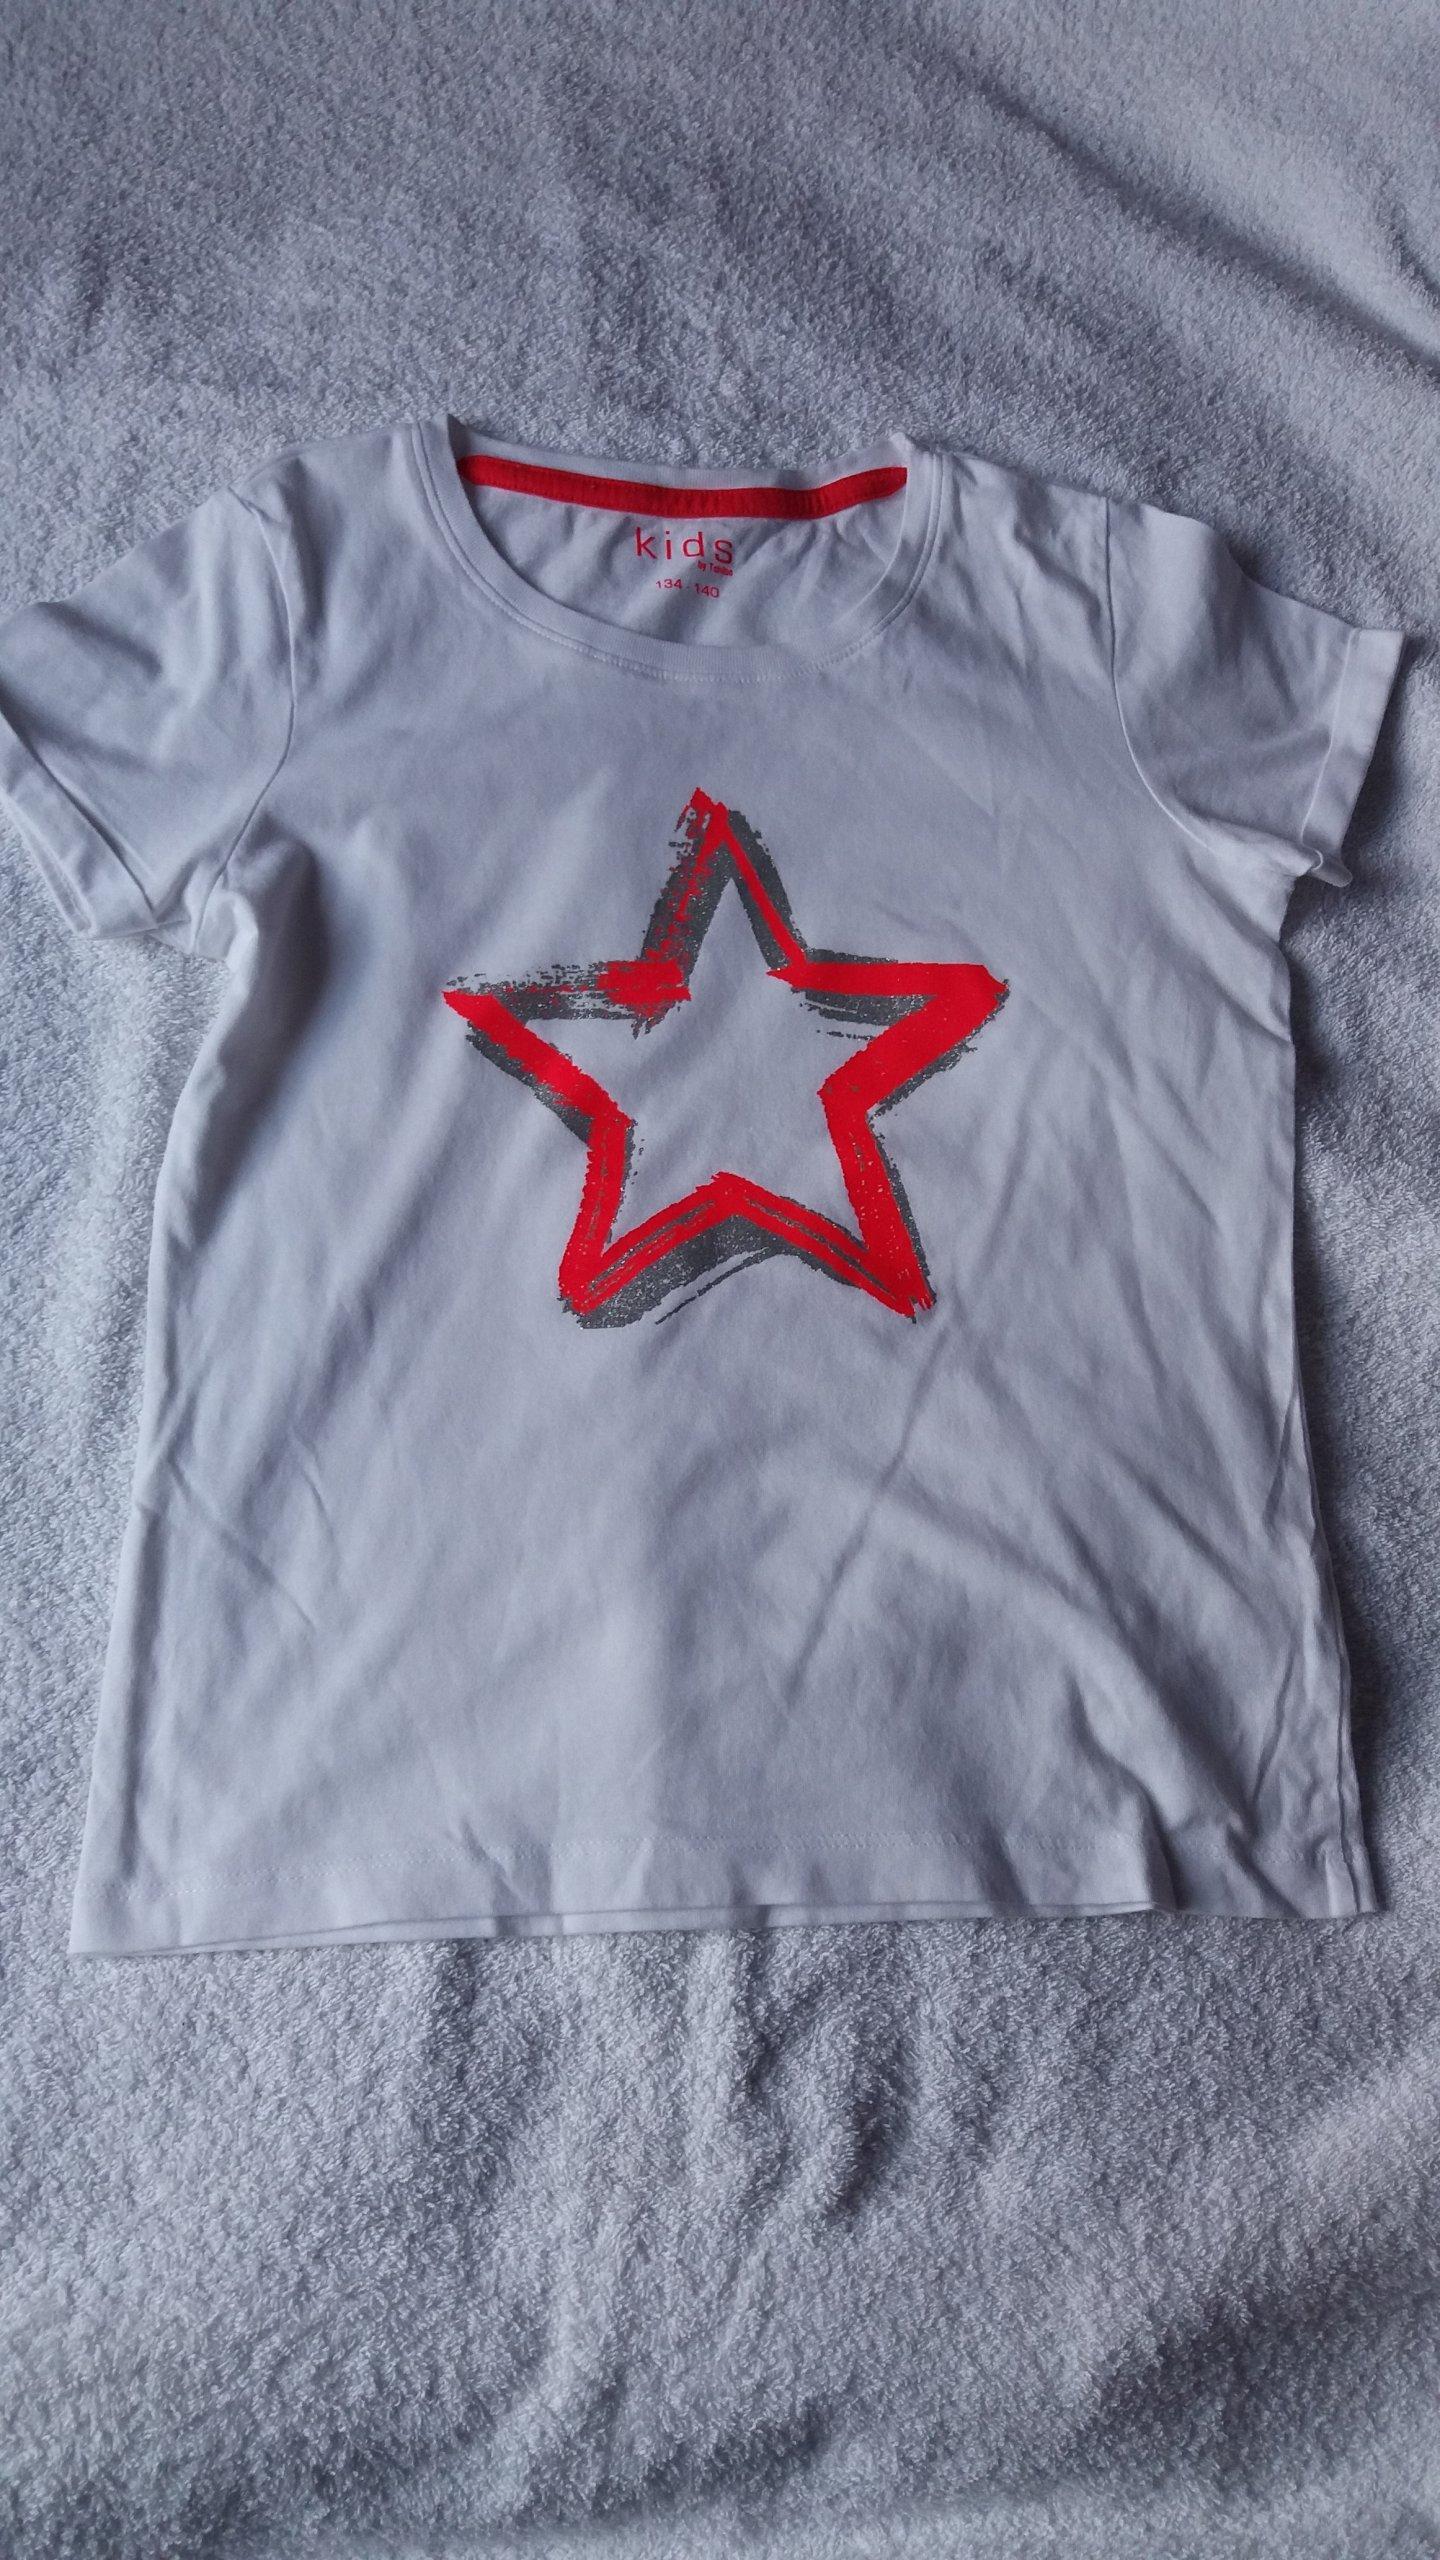 8a4173fe4d1325 TCHIBO Bluzka koszulka biała rozmiar 134-140 - 7394123284 ...